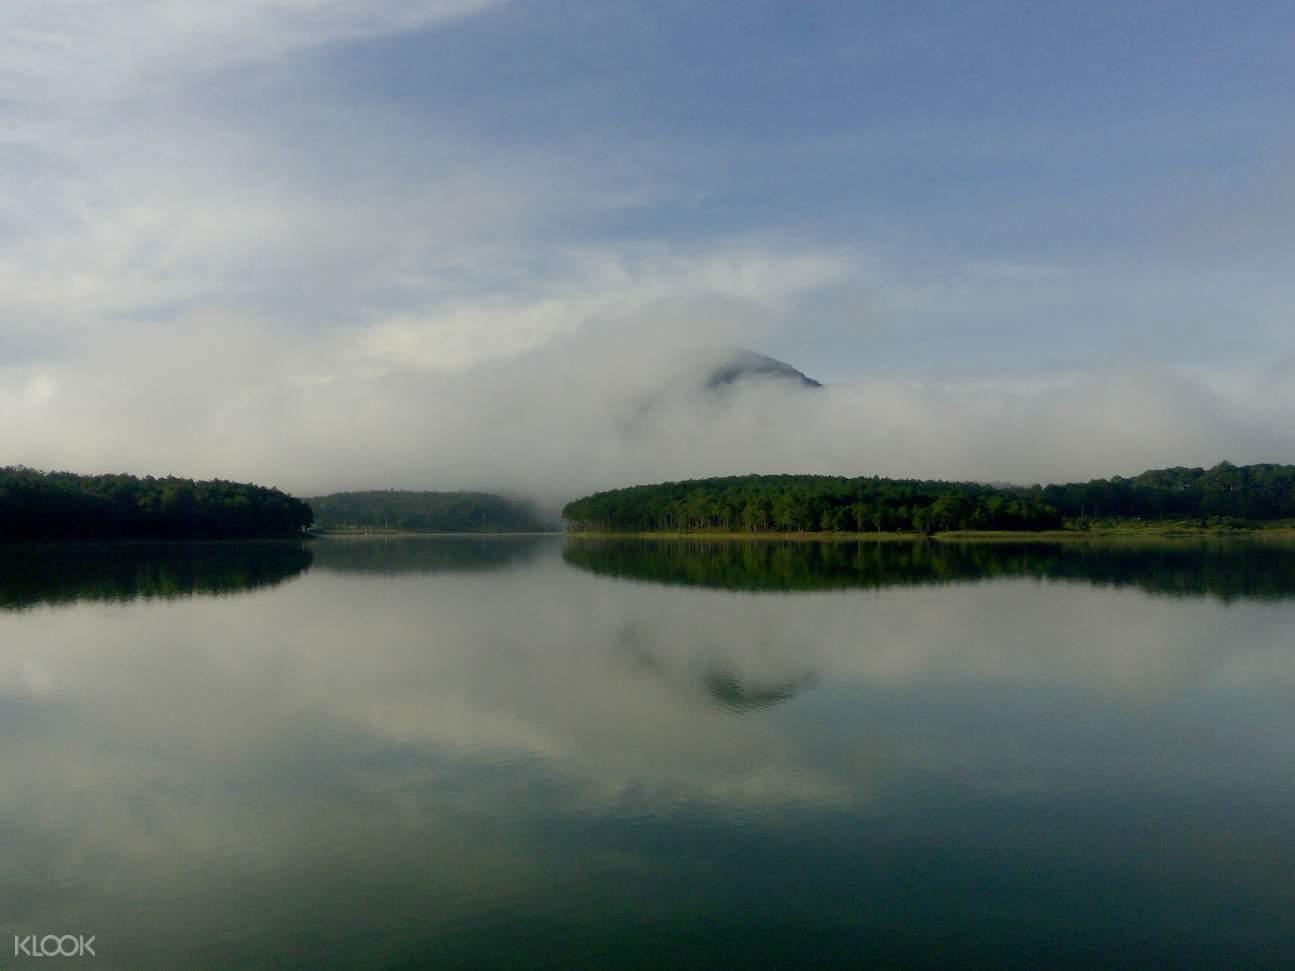 宣林湖(Tuyen Lam Lake)